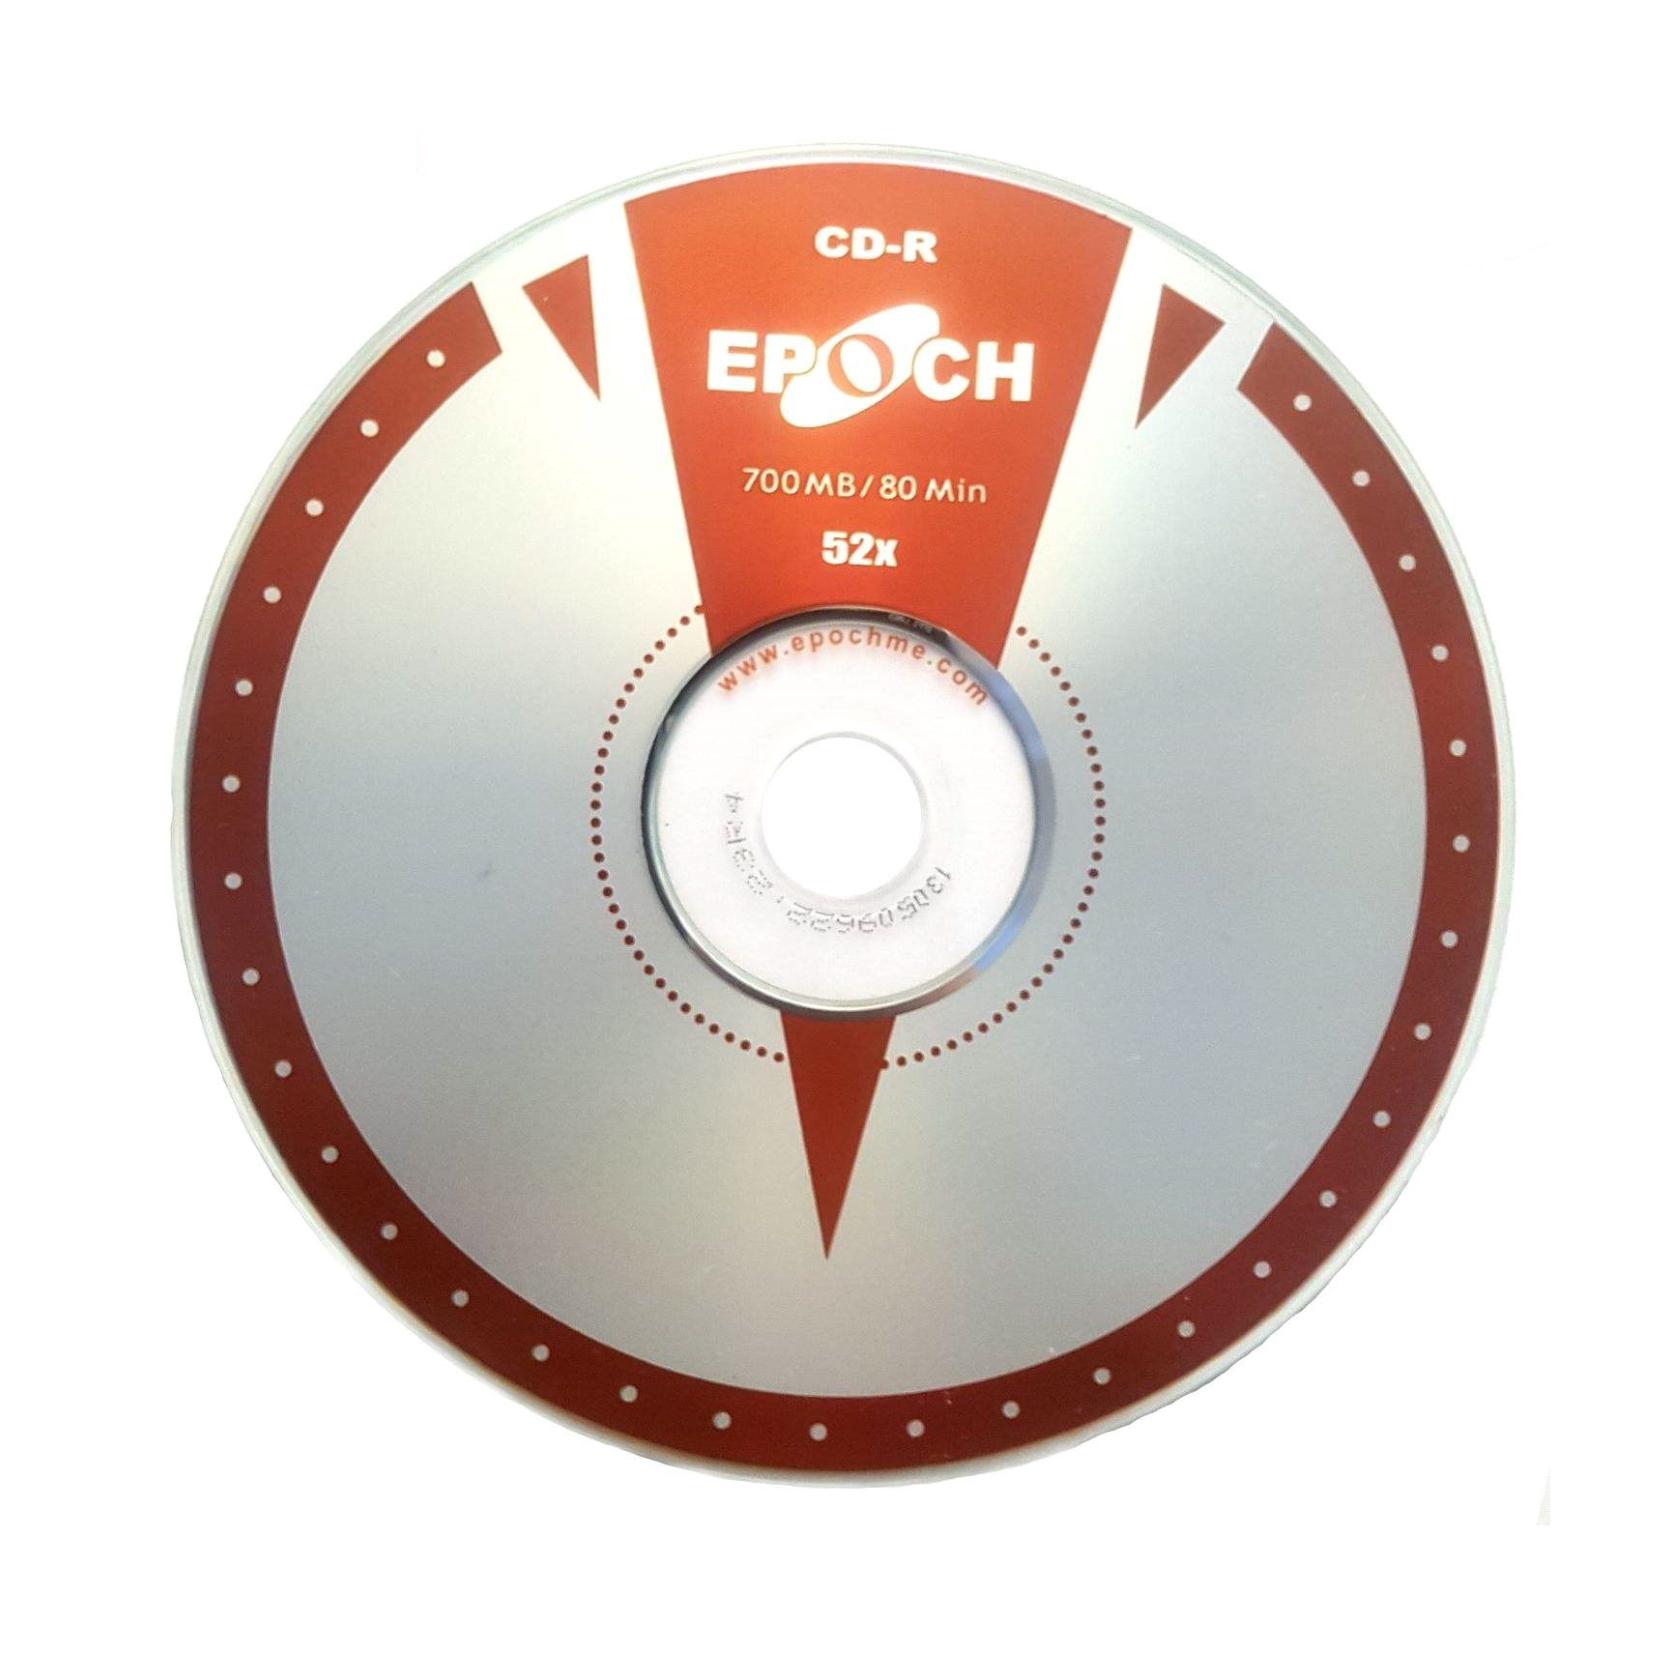 سی دی خام اپوچ مدل EP1